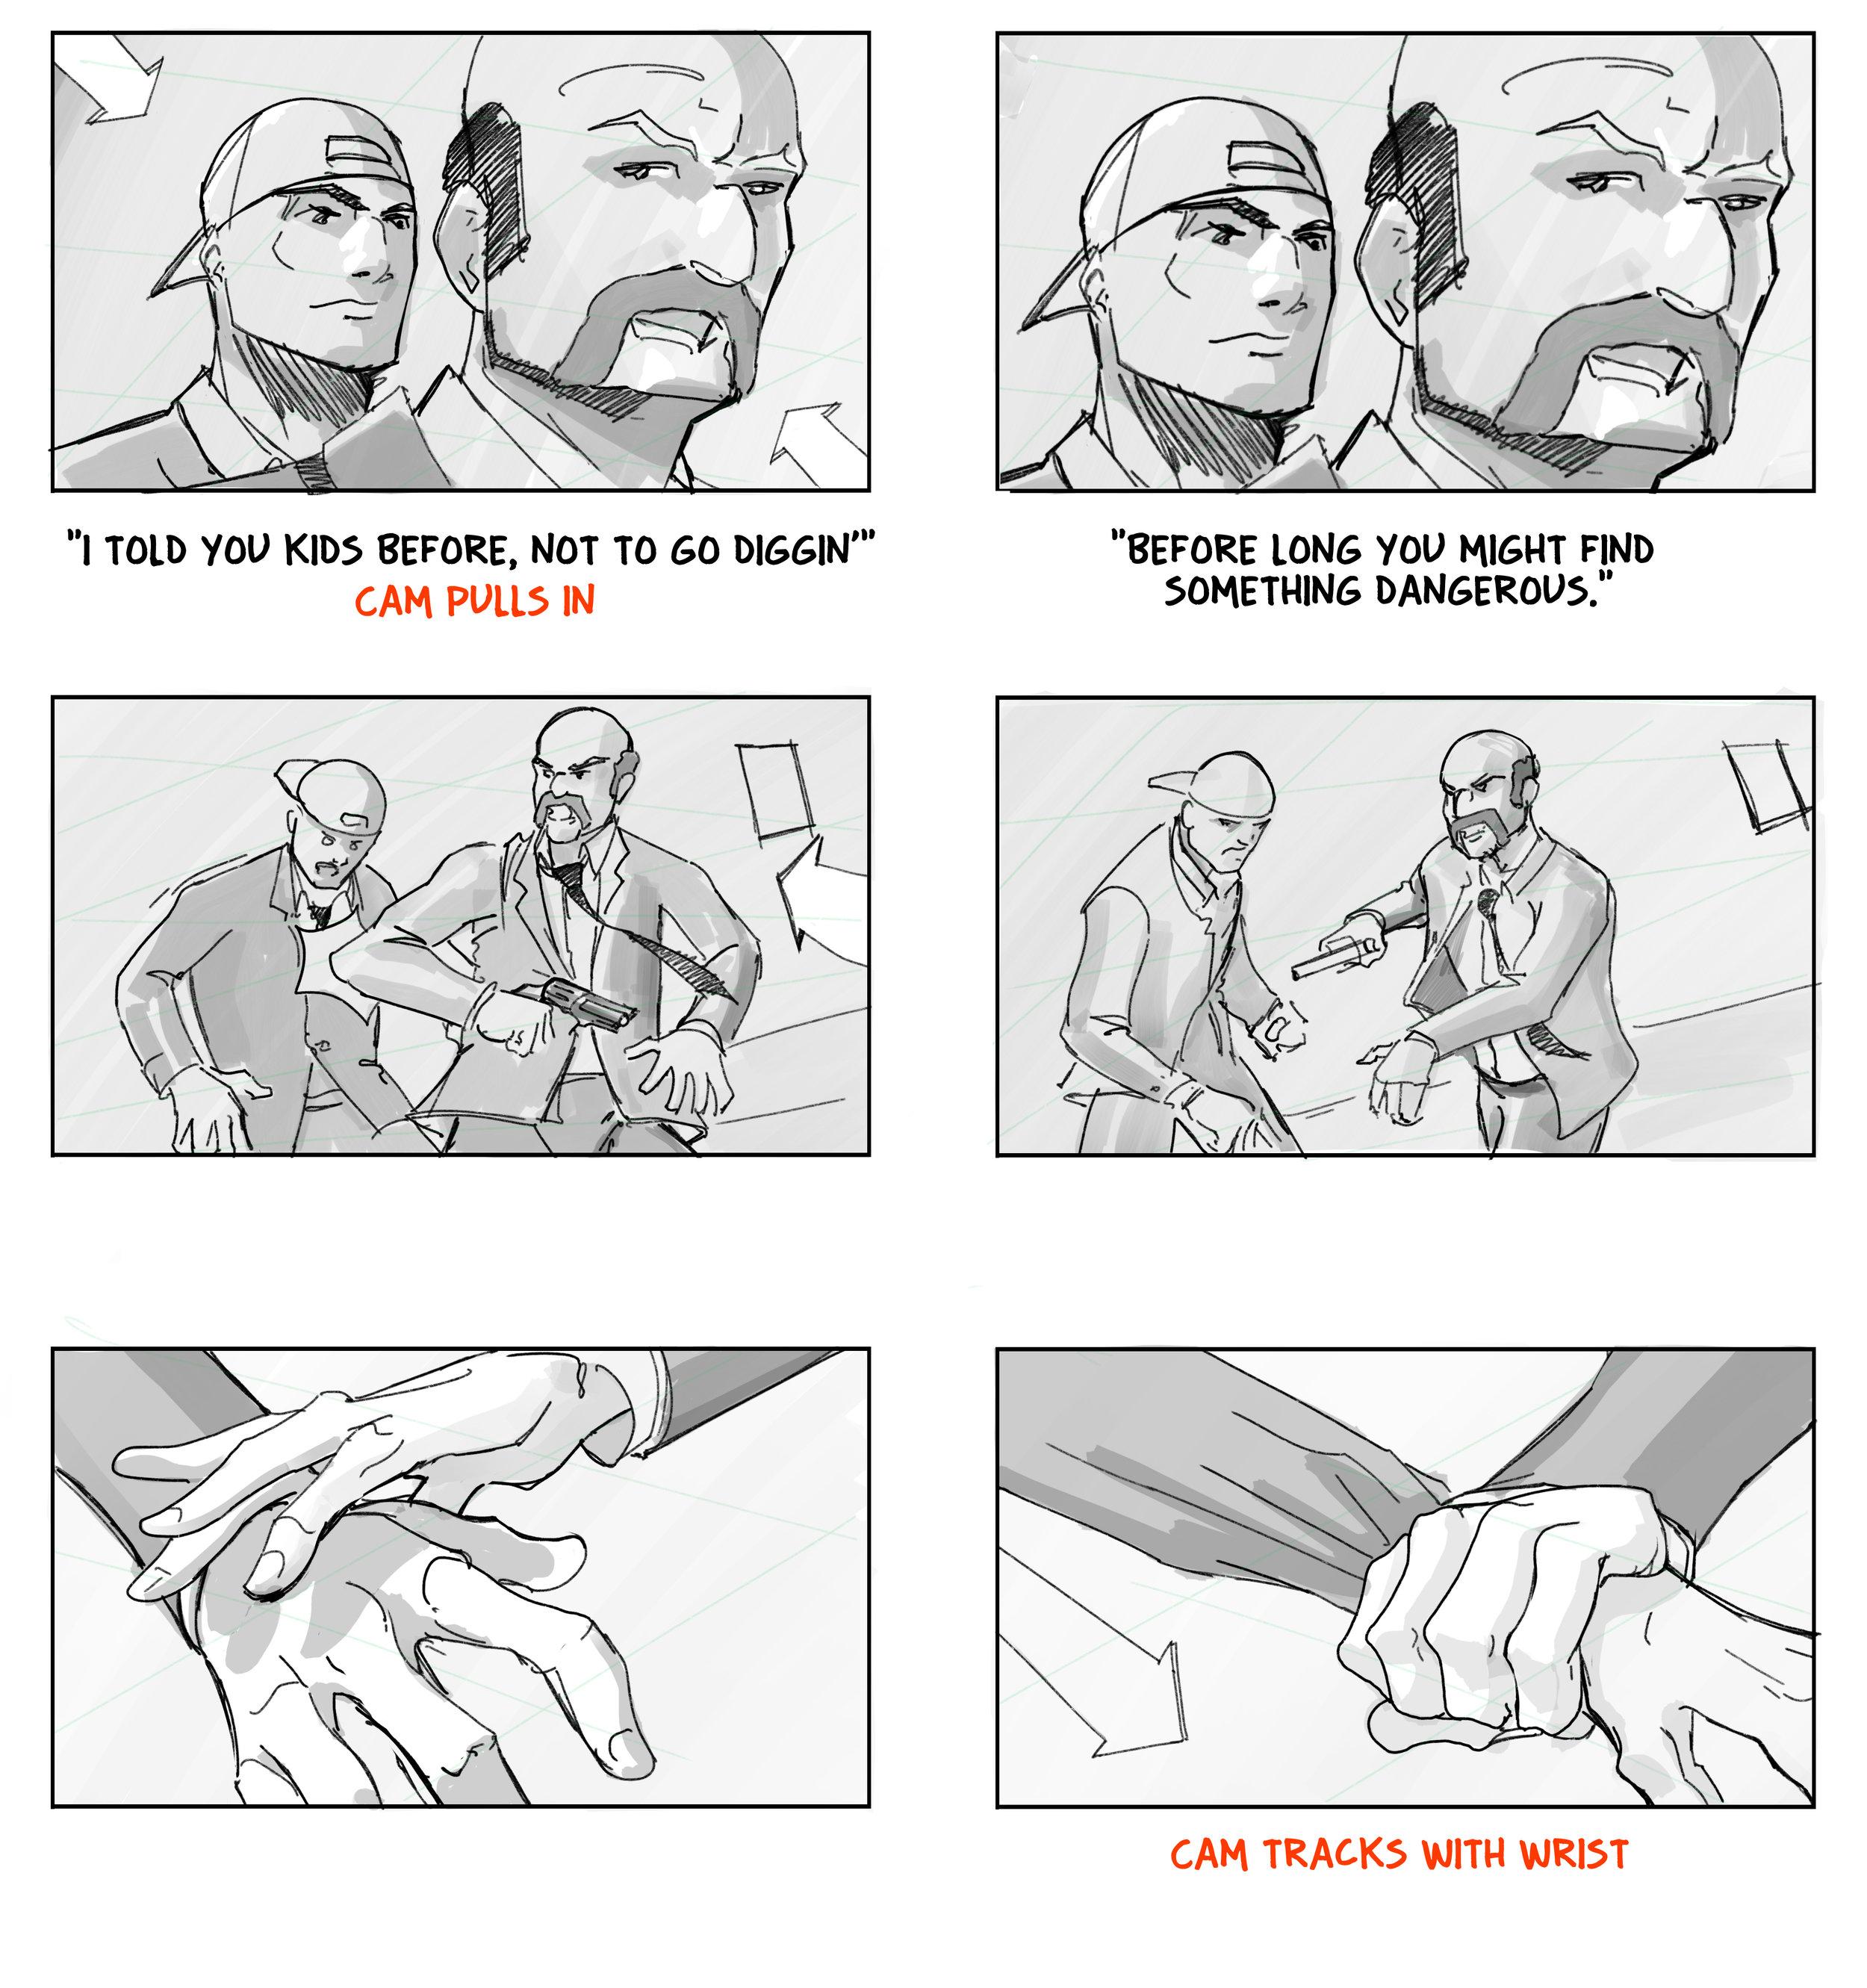 SAM_BS_Catapano_Storyboards_008.jpg